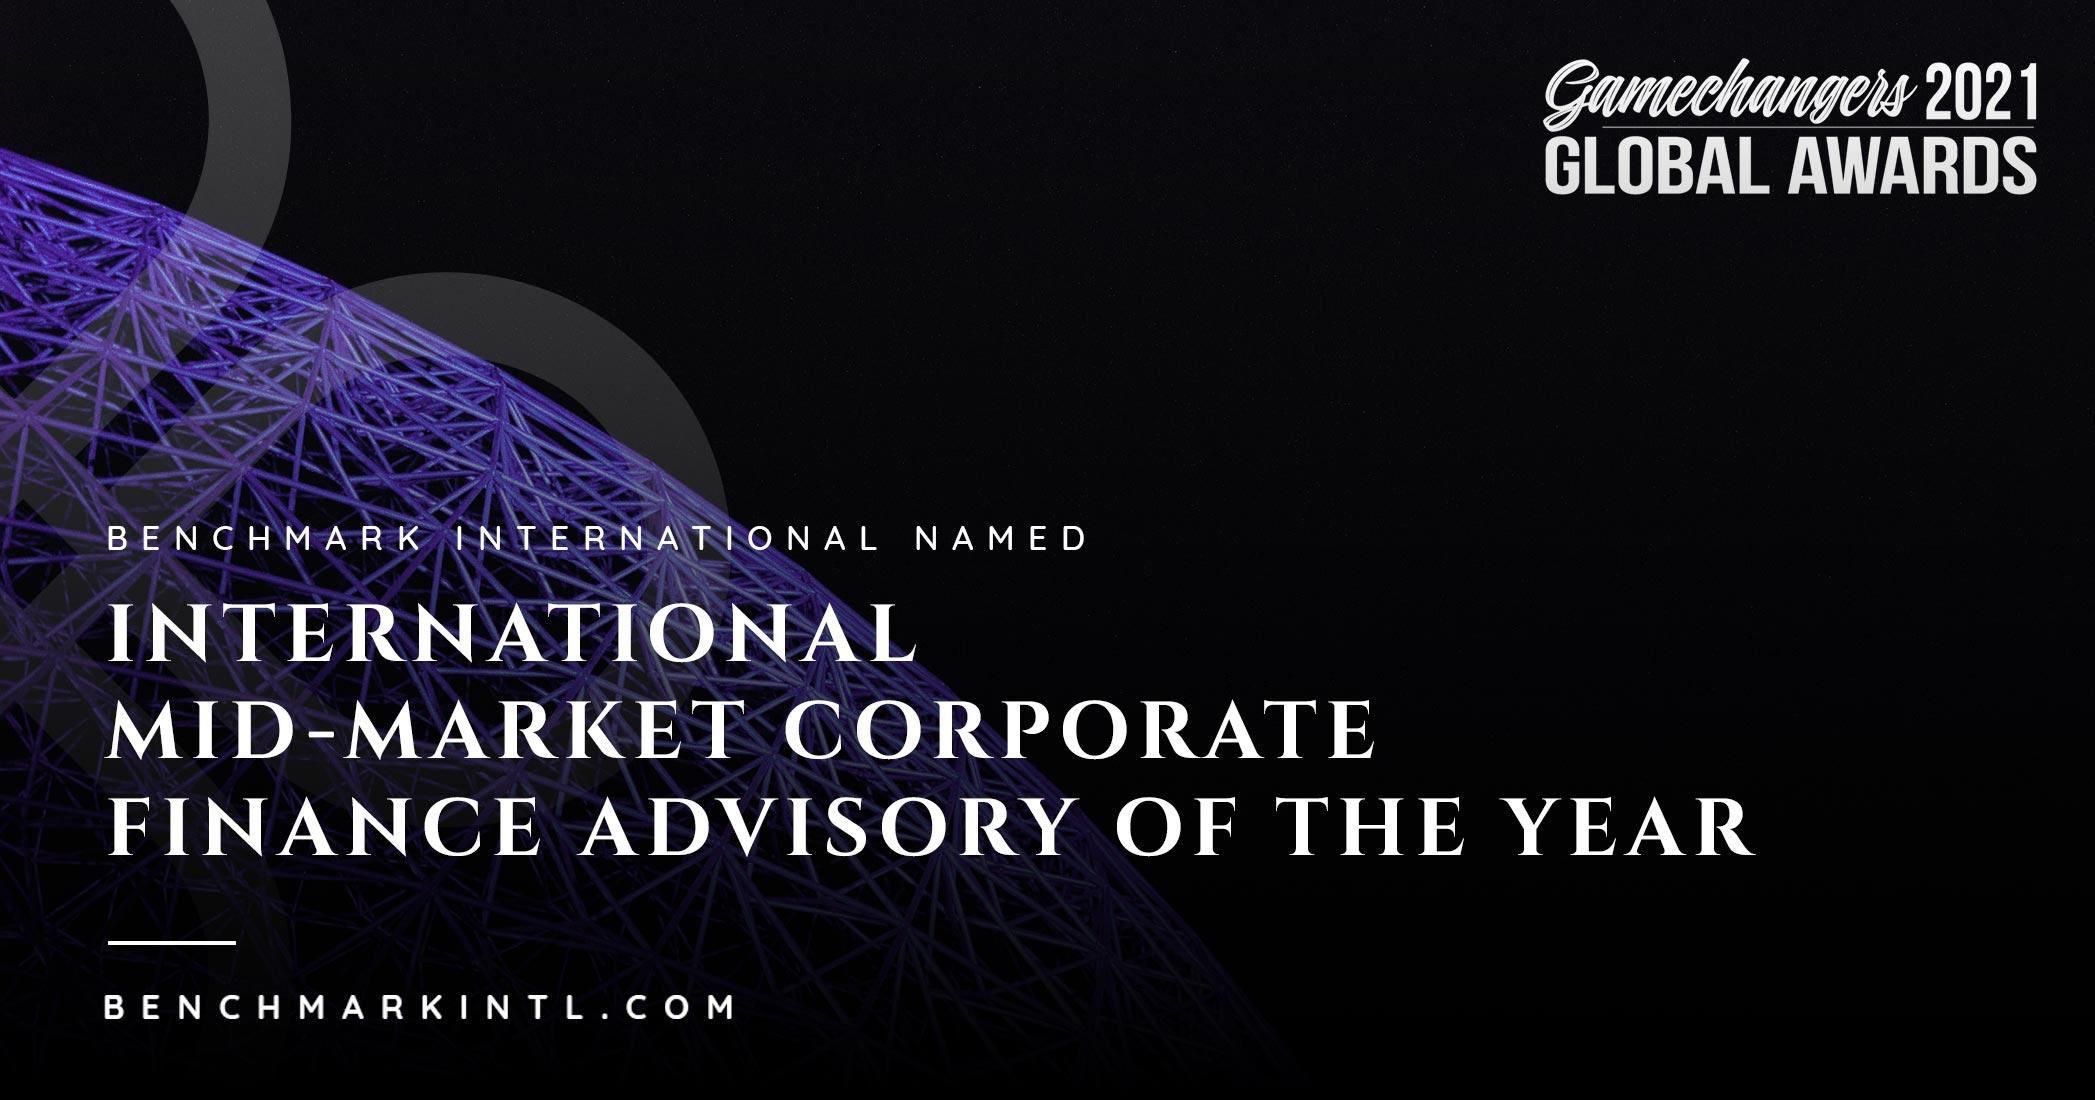 Benchmark International Named International Mid-Market Corporate Finance Advisory Of The Year